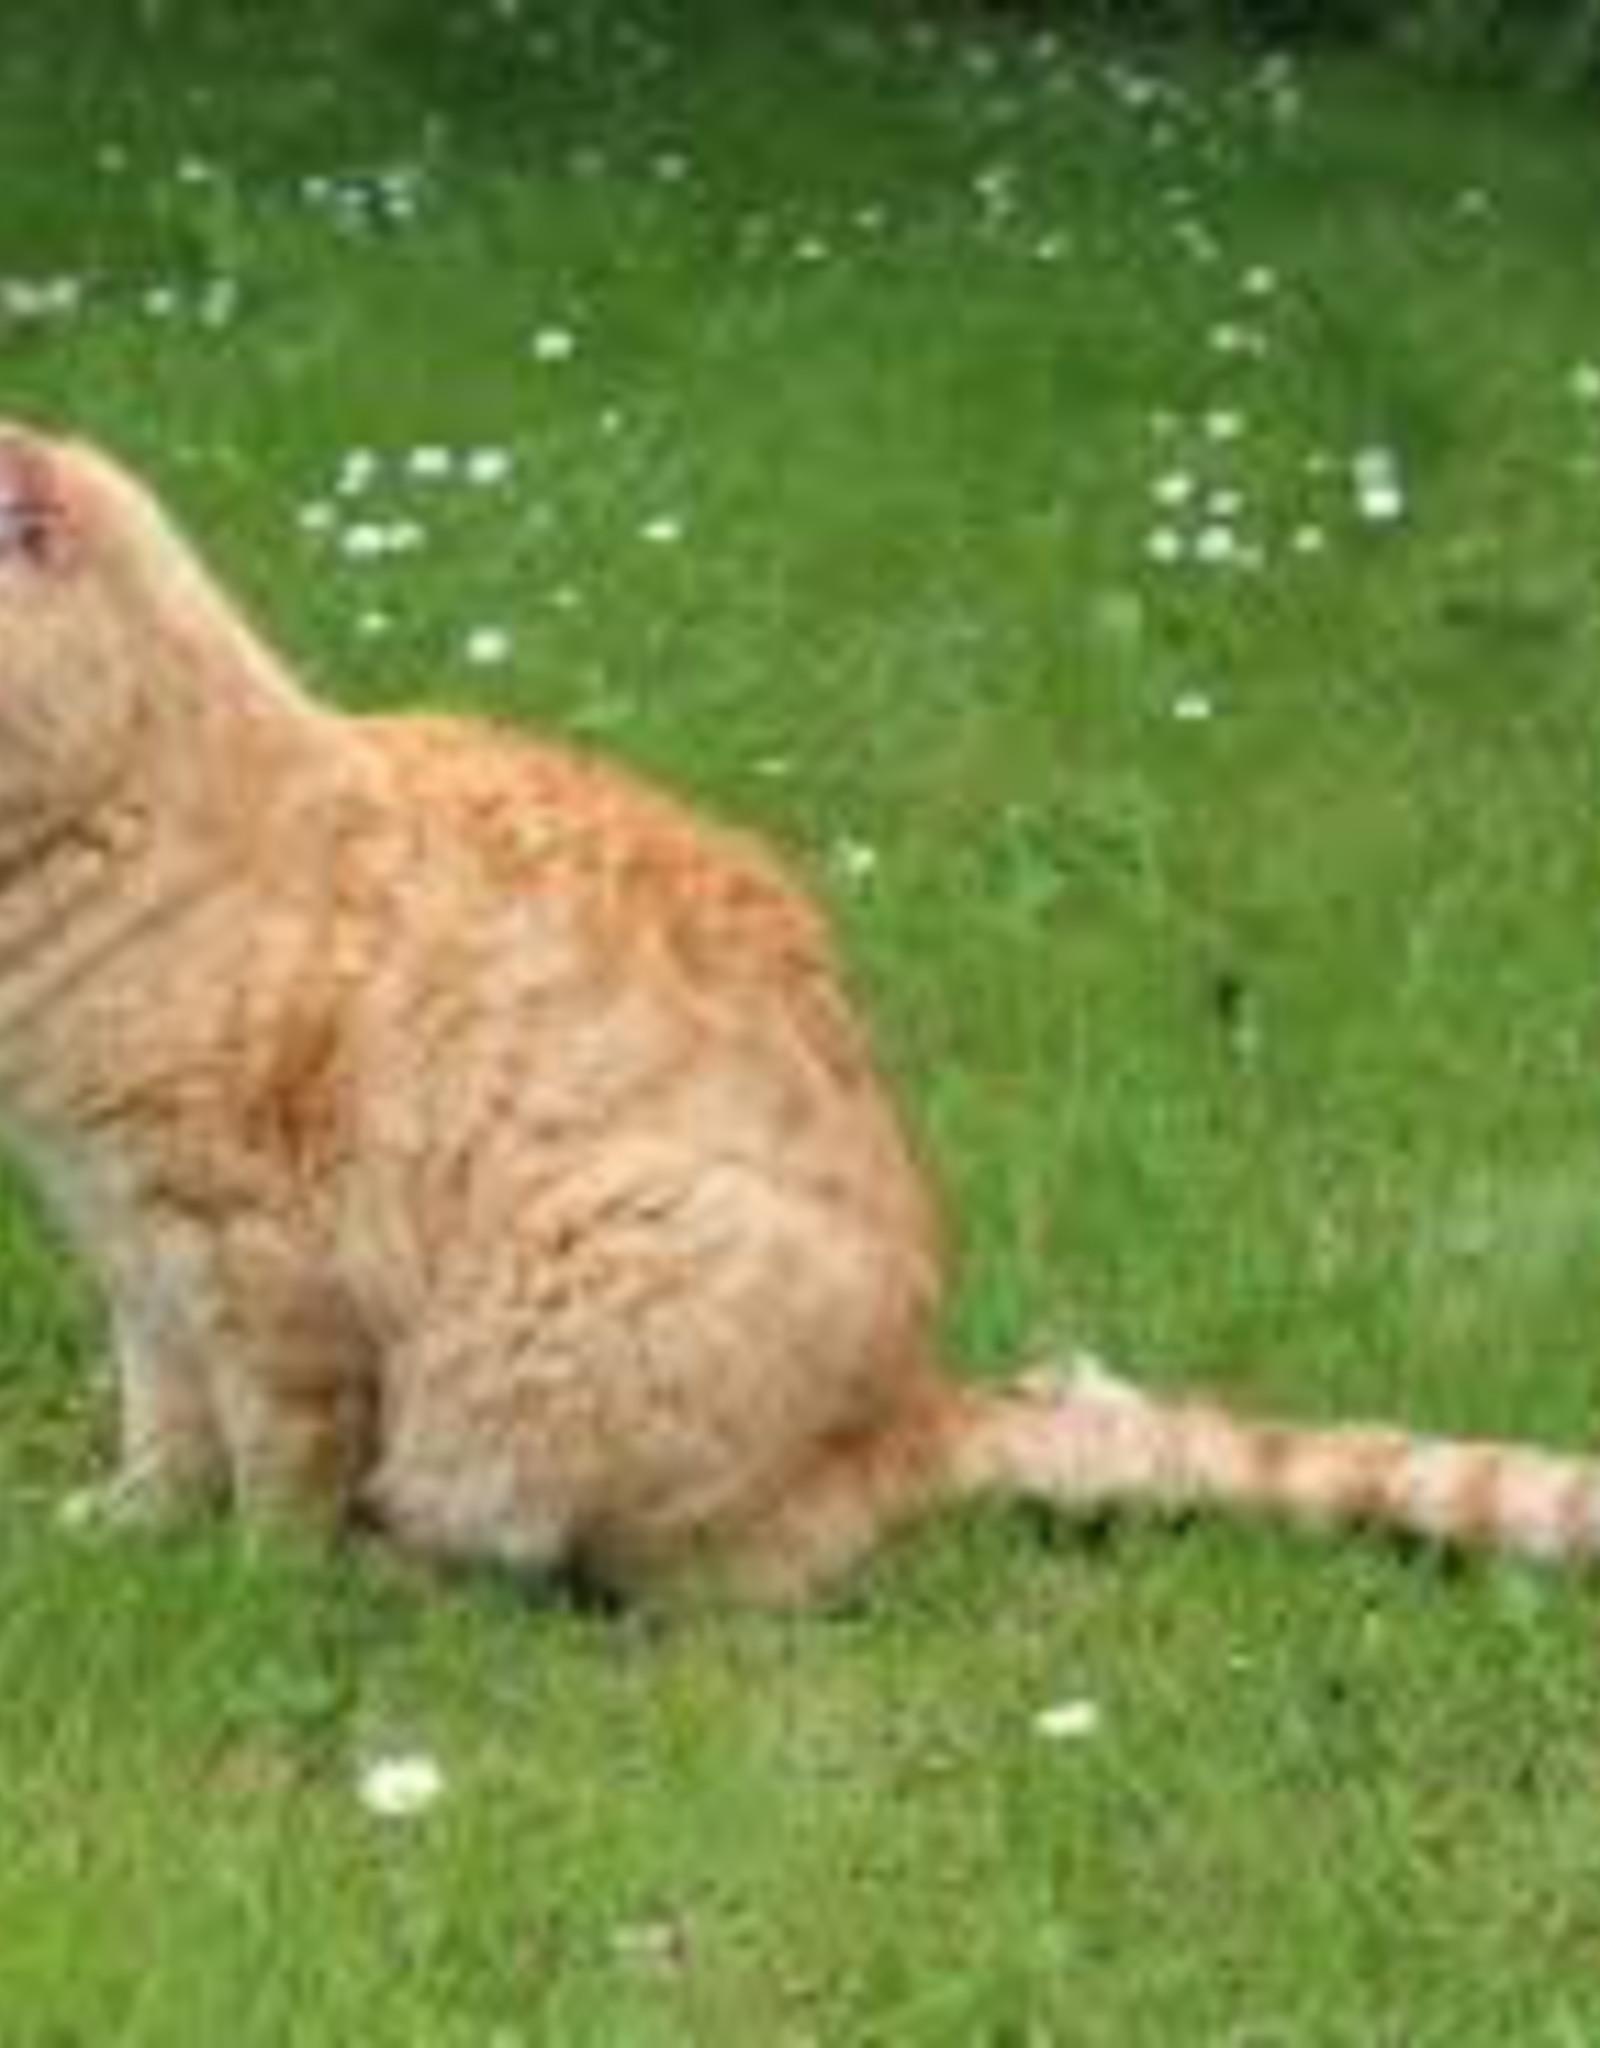 Brimex Tupoleum Katten weren met Brimex geurpaal tegen o.a. katten en konijnen